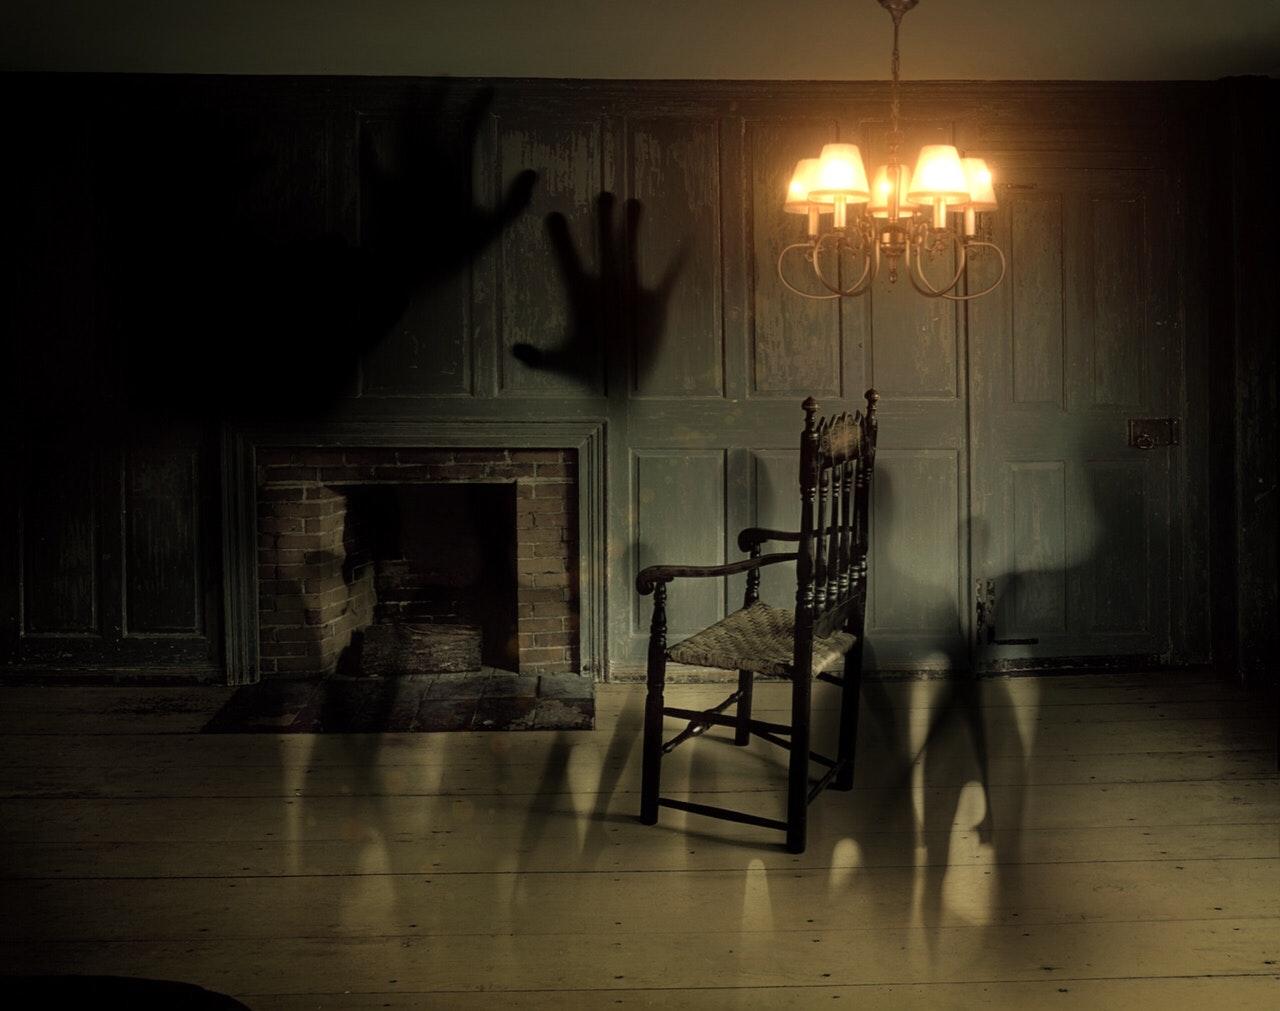 ghostely figures on shudder